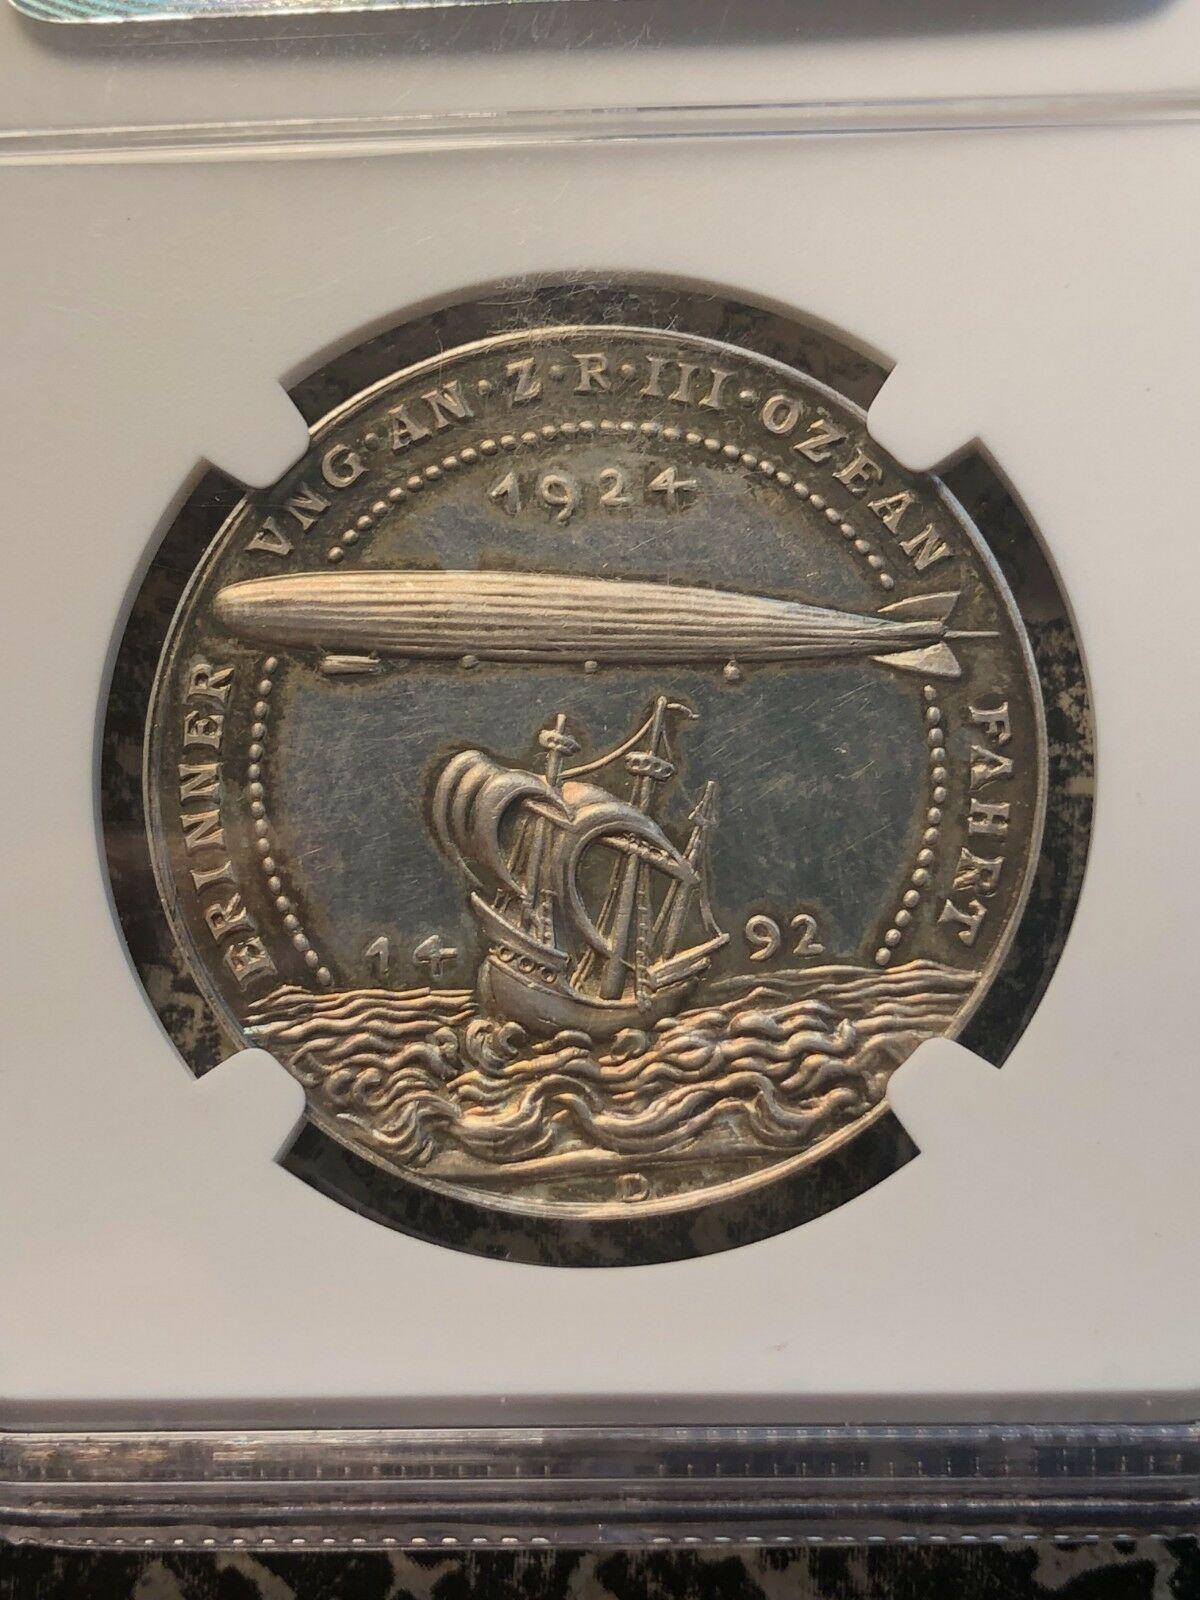 1924 Alemania Karl Goetz Zeppelin Medalla NGC Ms63 Lote #G960 de Plata !Bonito!